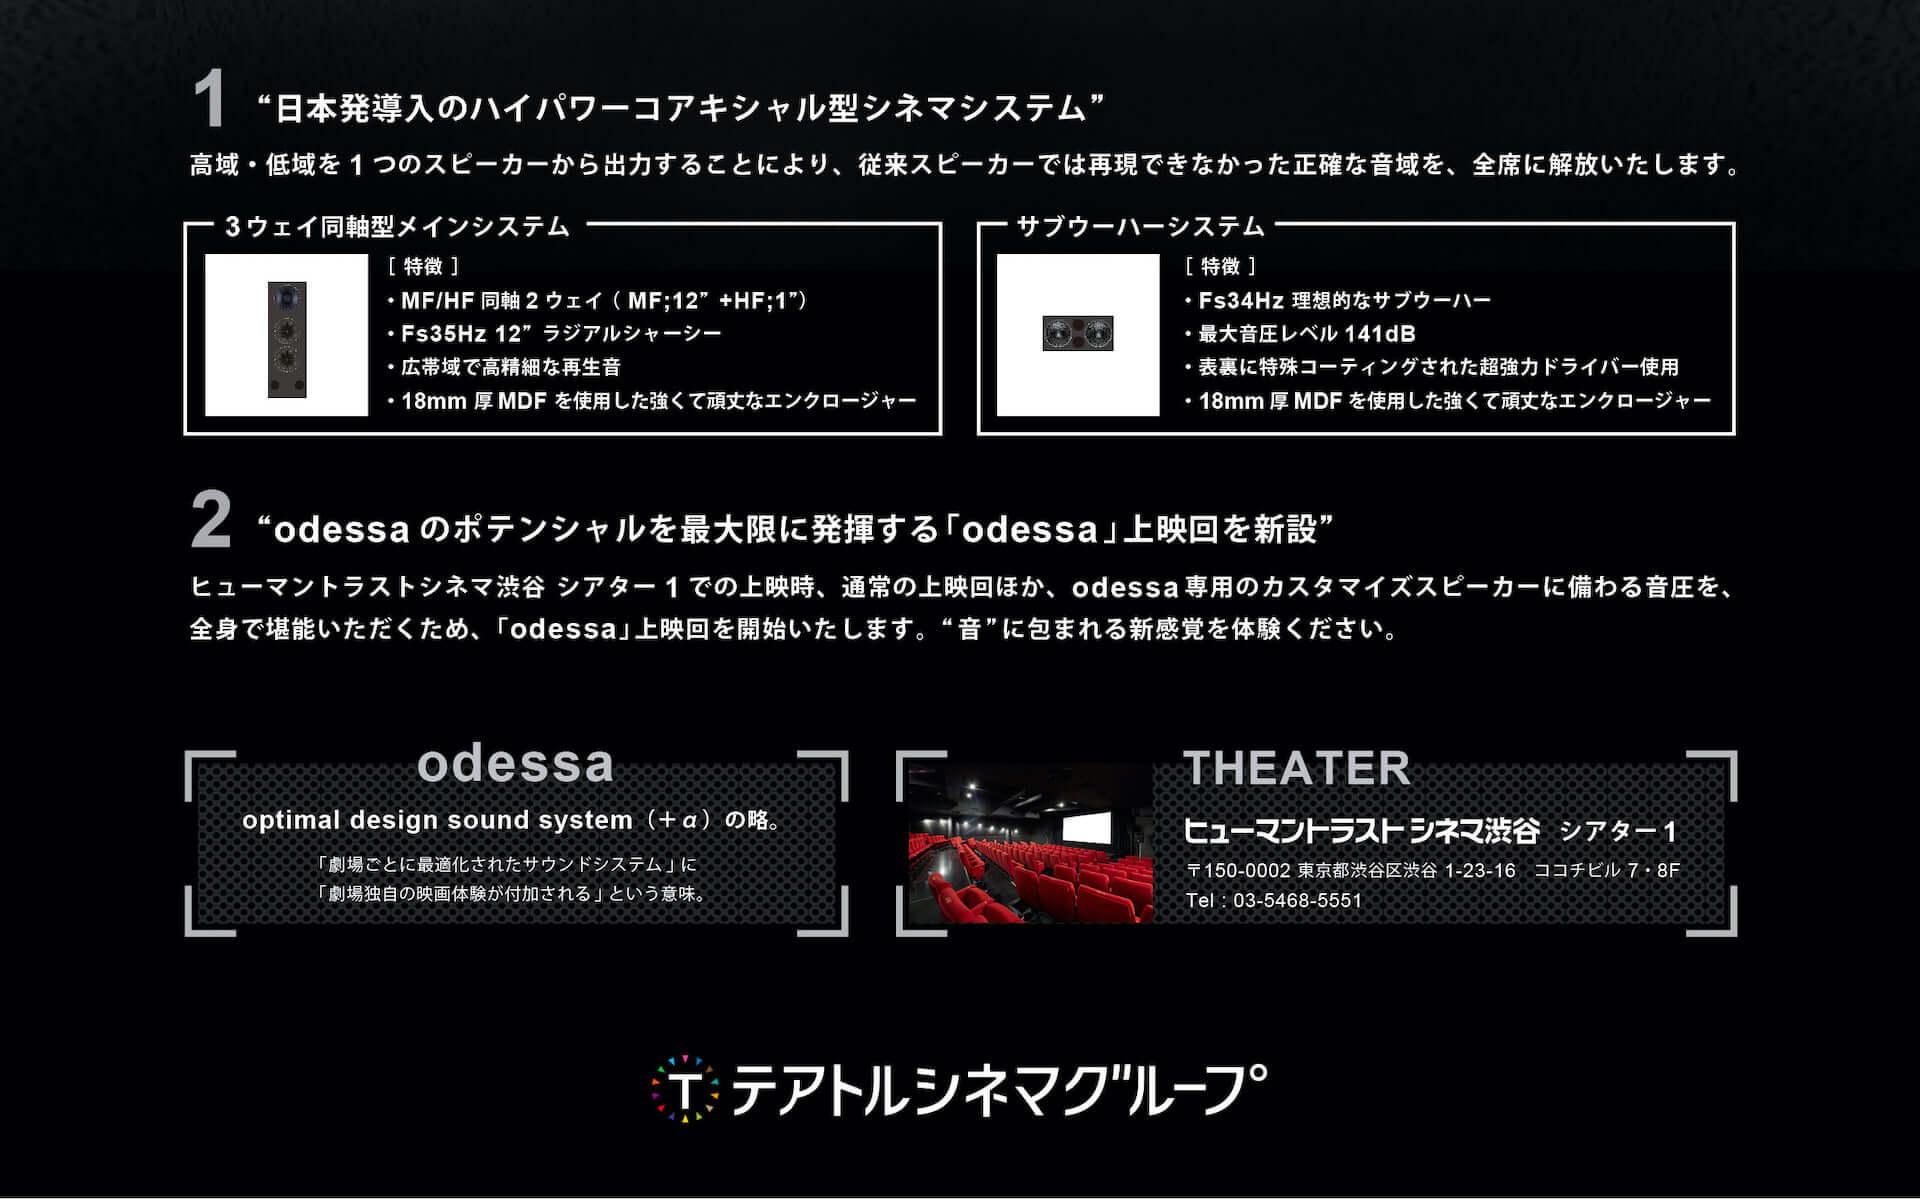 Kamasi Washingtonによる映画音楽作品『Becoming』のライブ映像を映画館で!オリジナル・スコアの演奏を楽しめる上映イベントが渋谷で開催決定 music210330_kamasi-washington_3-1920x1200